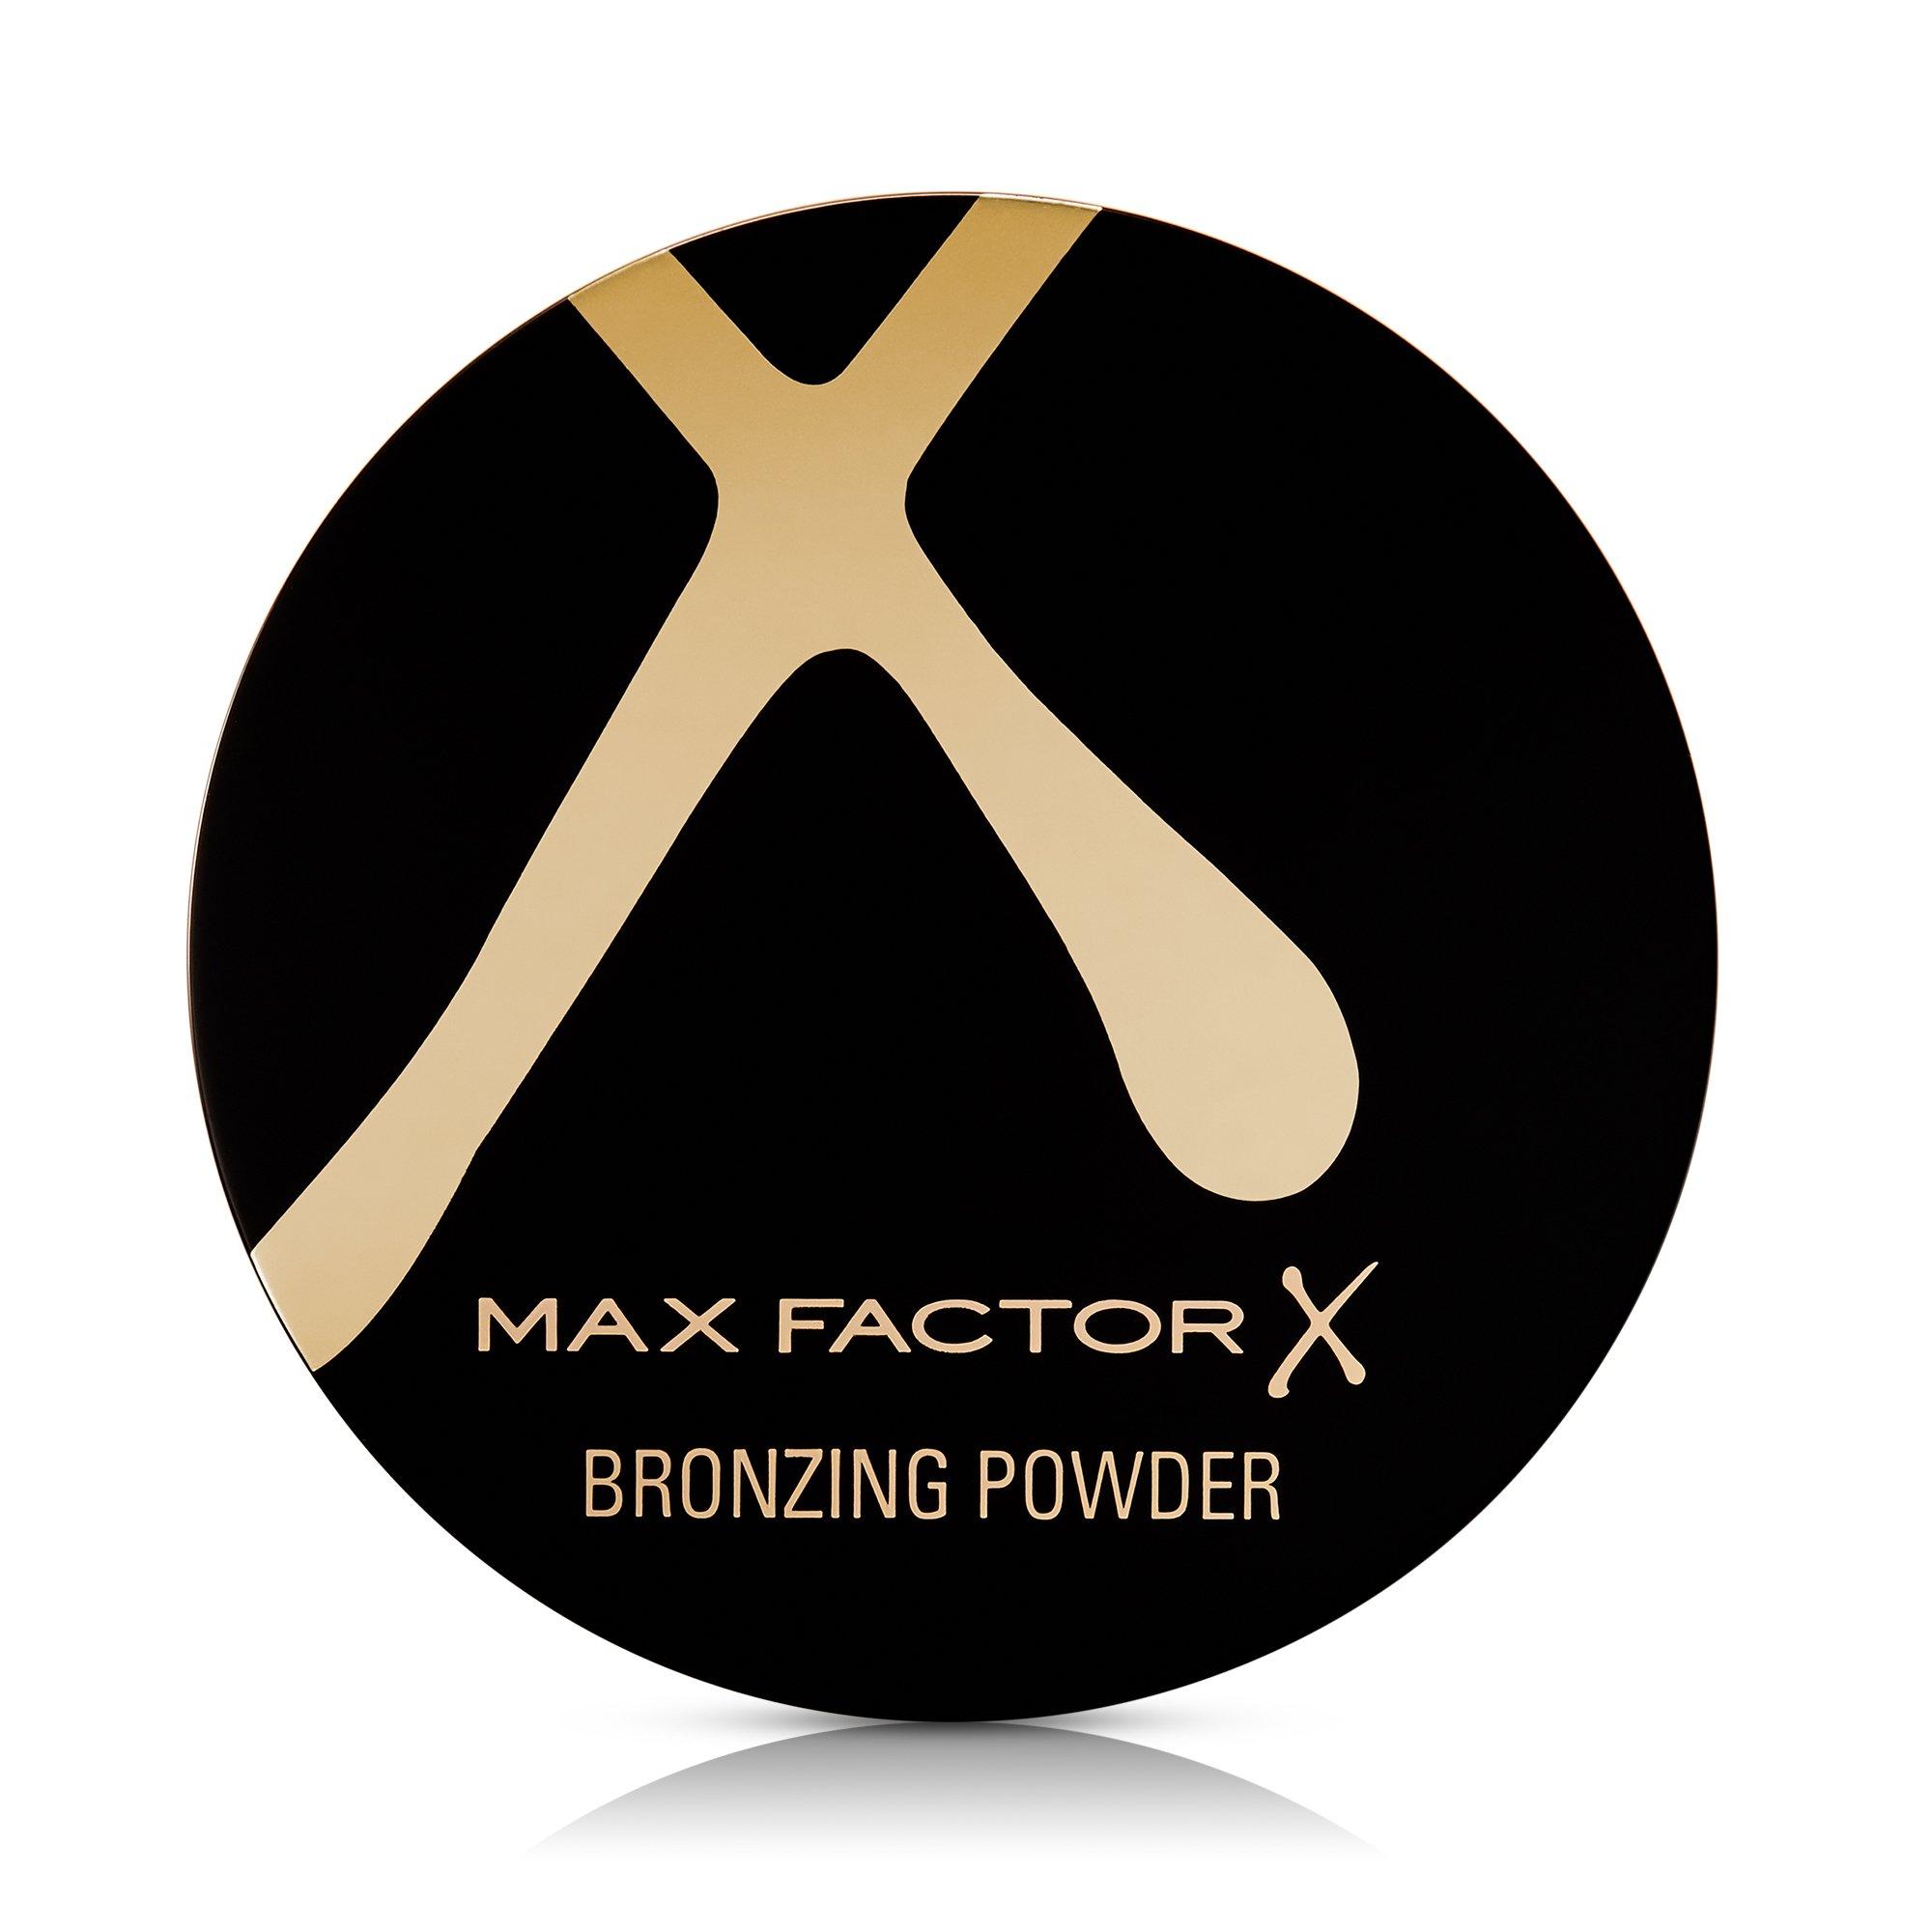 Max Factor Bronzing Powder for Women, 02 Bronze